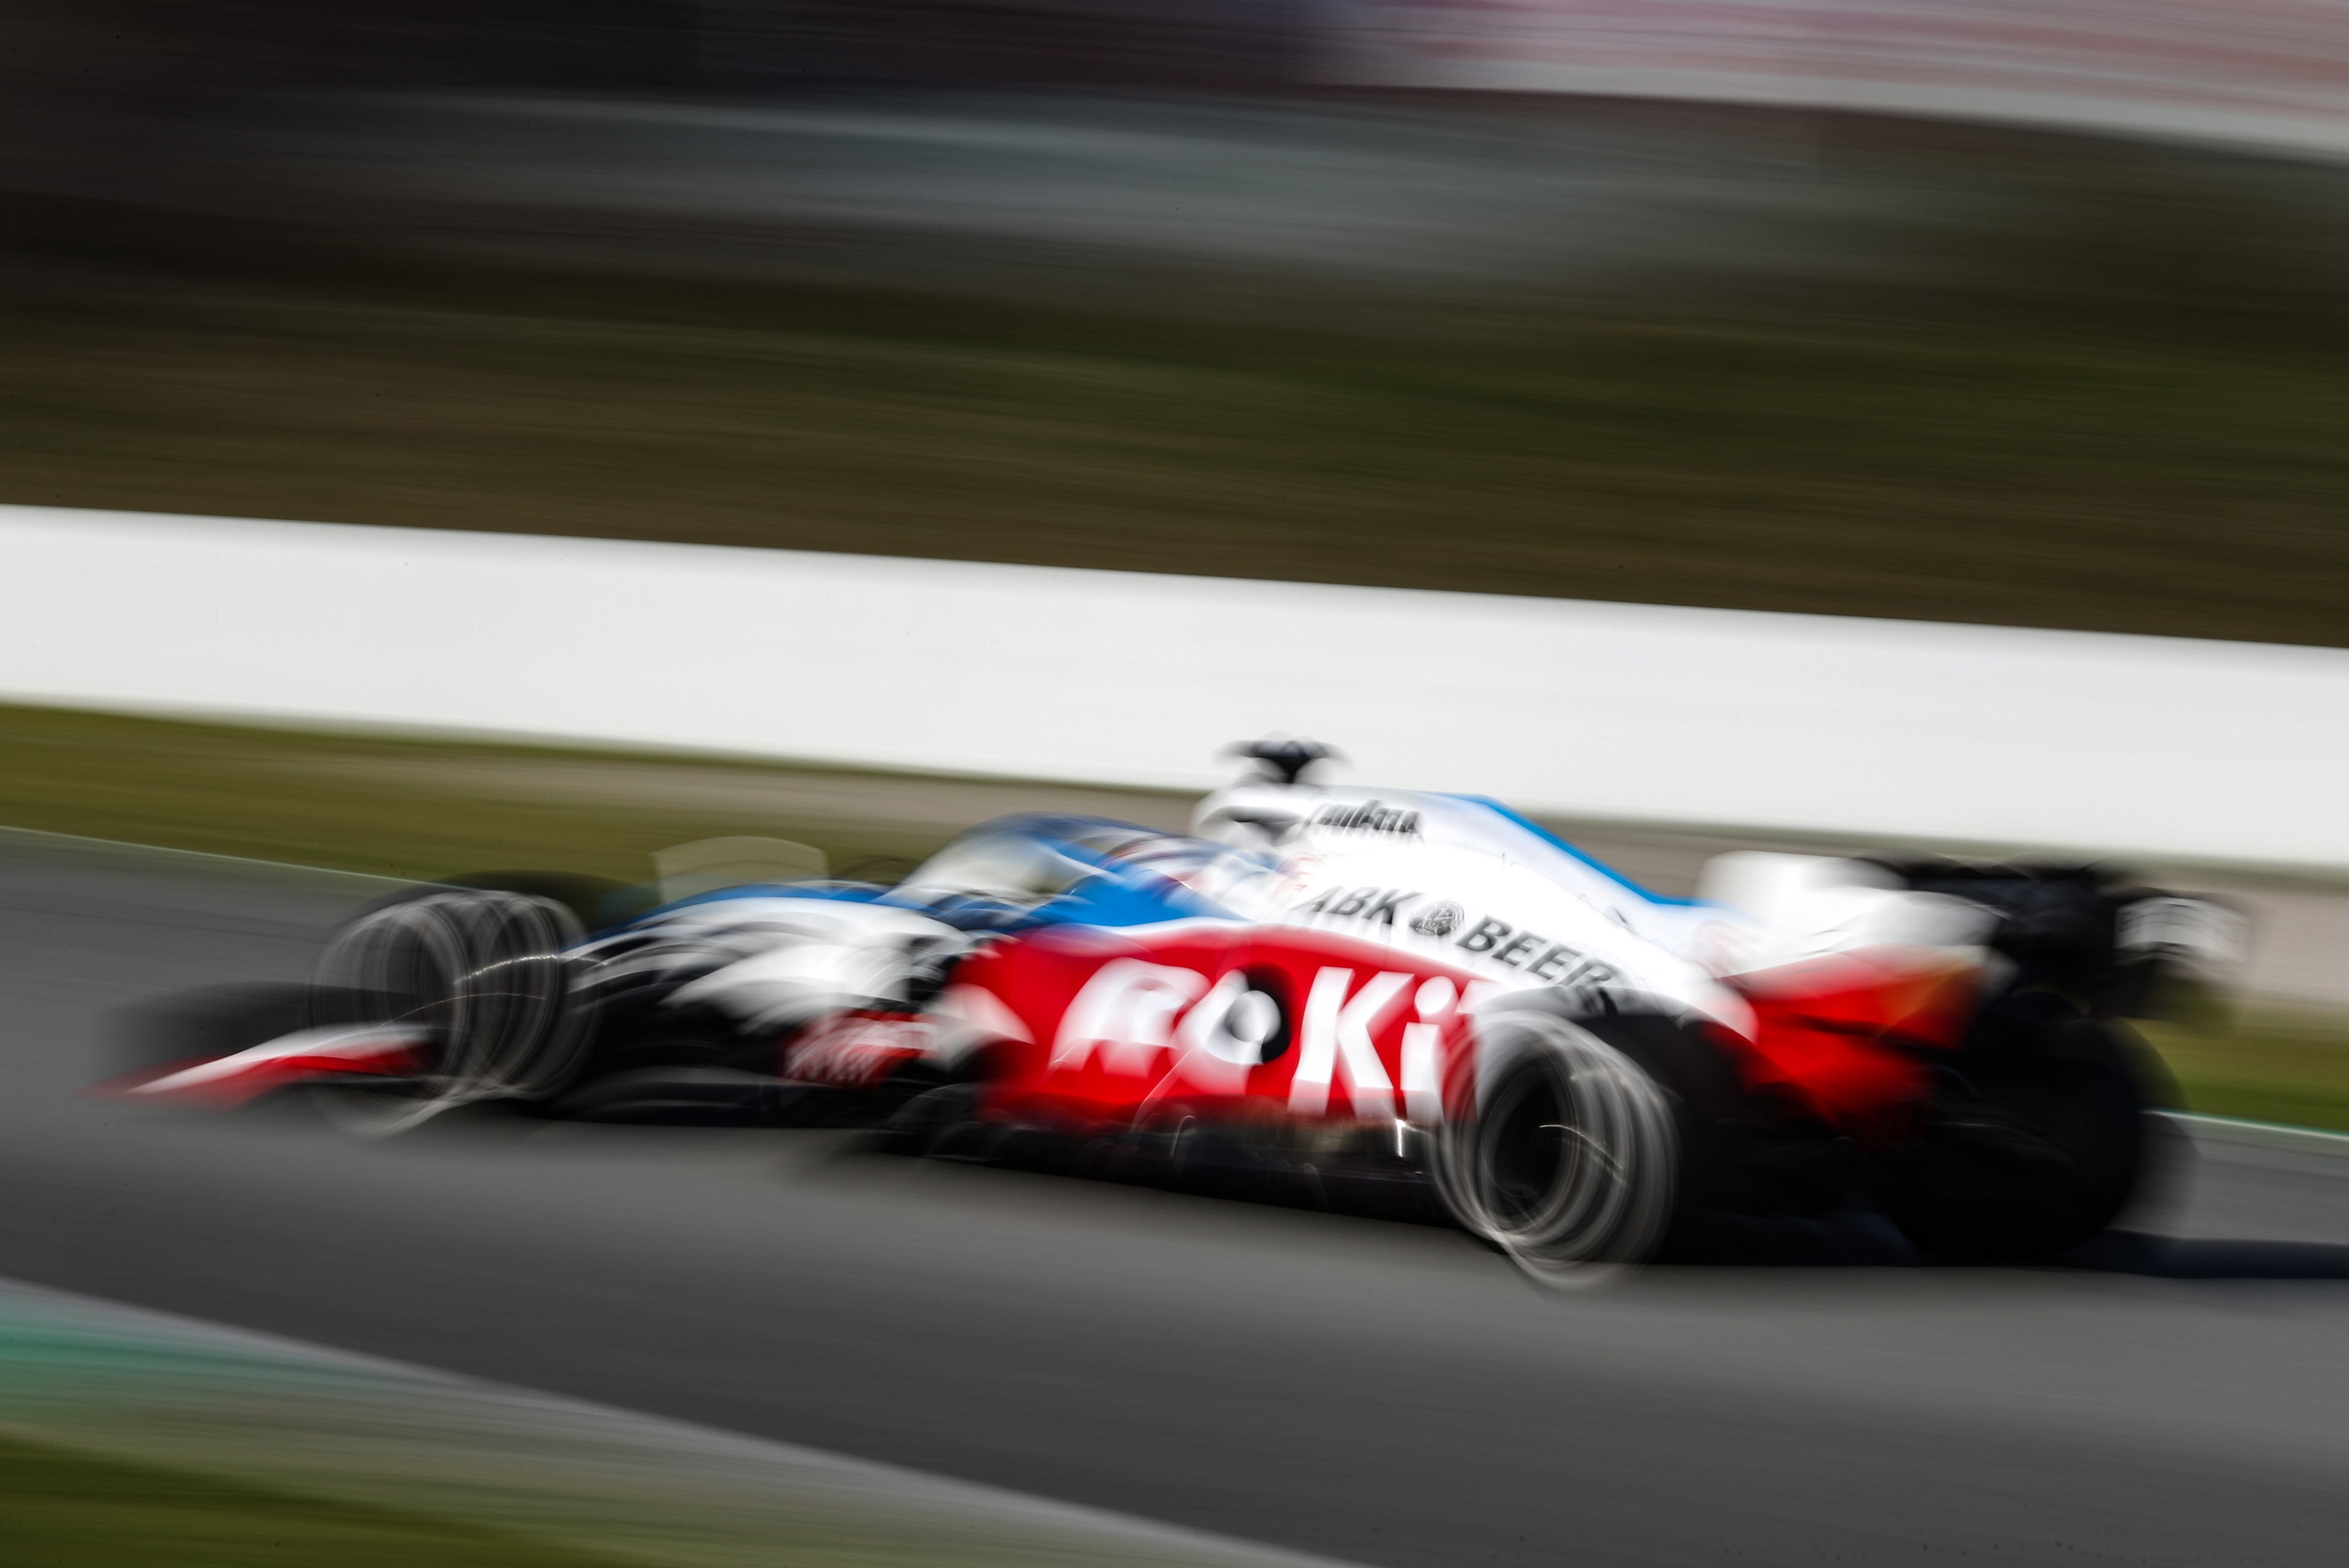 Motor Racing Formula One Testing Test Two Day 2 Barcelona, Spain